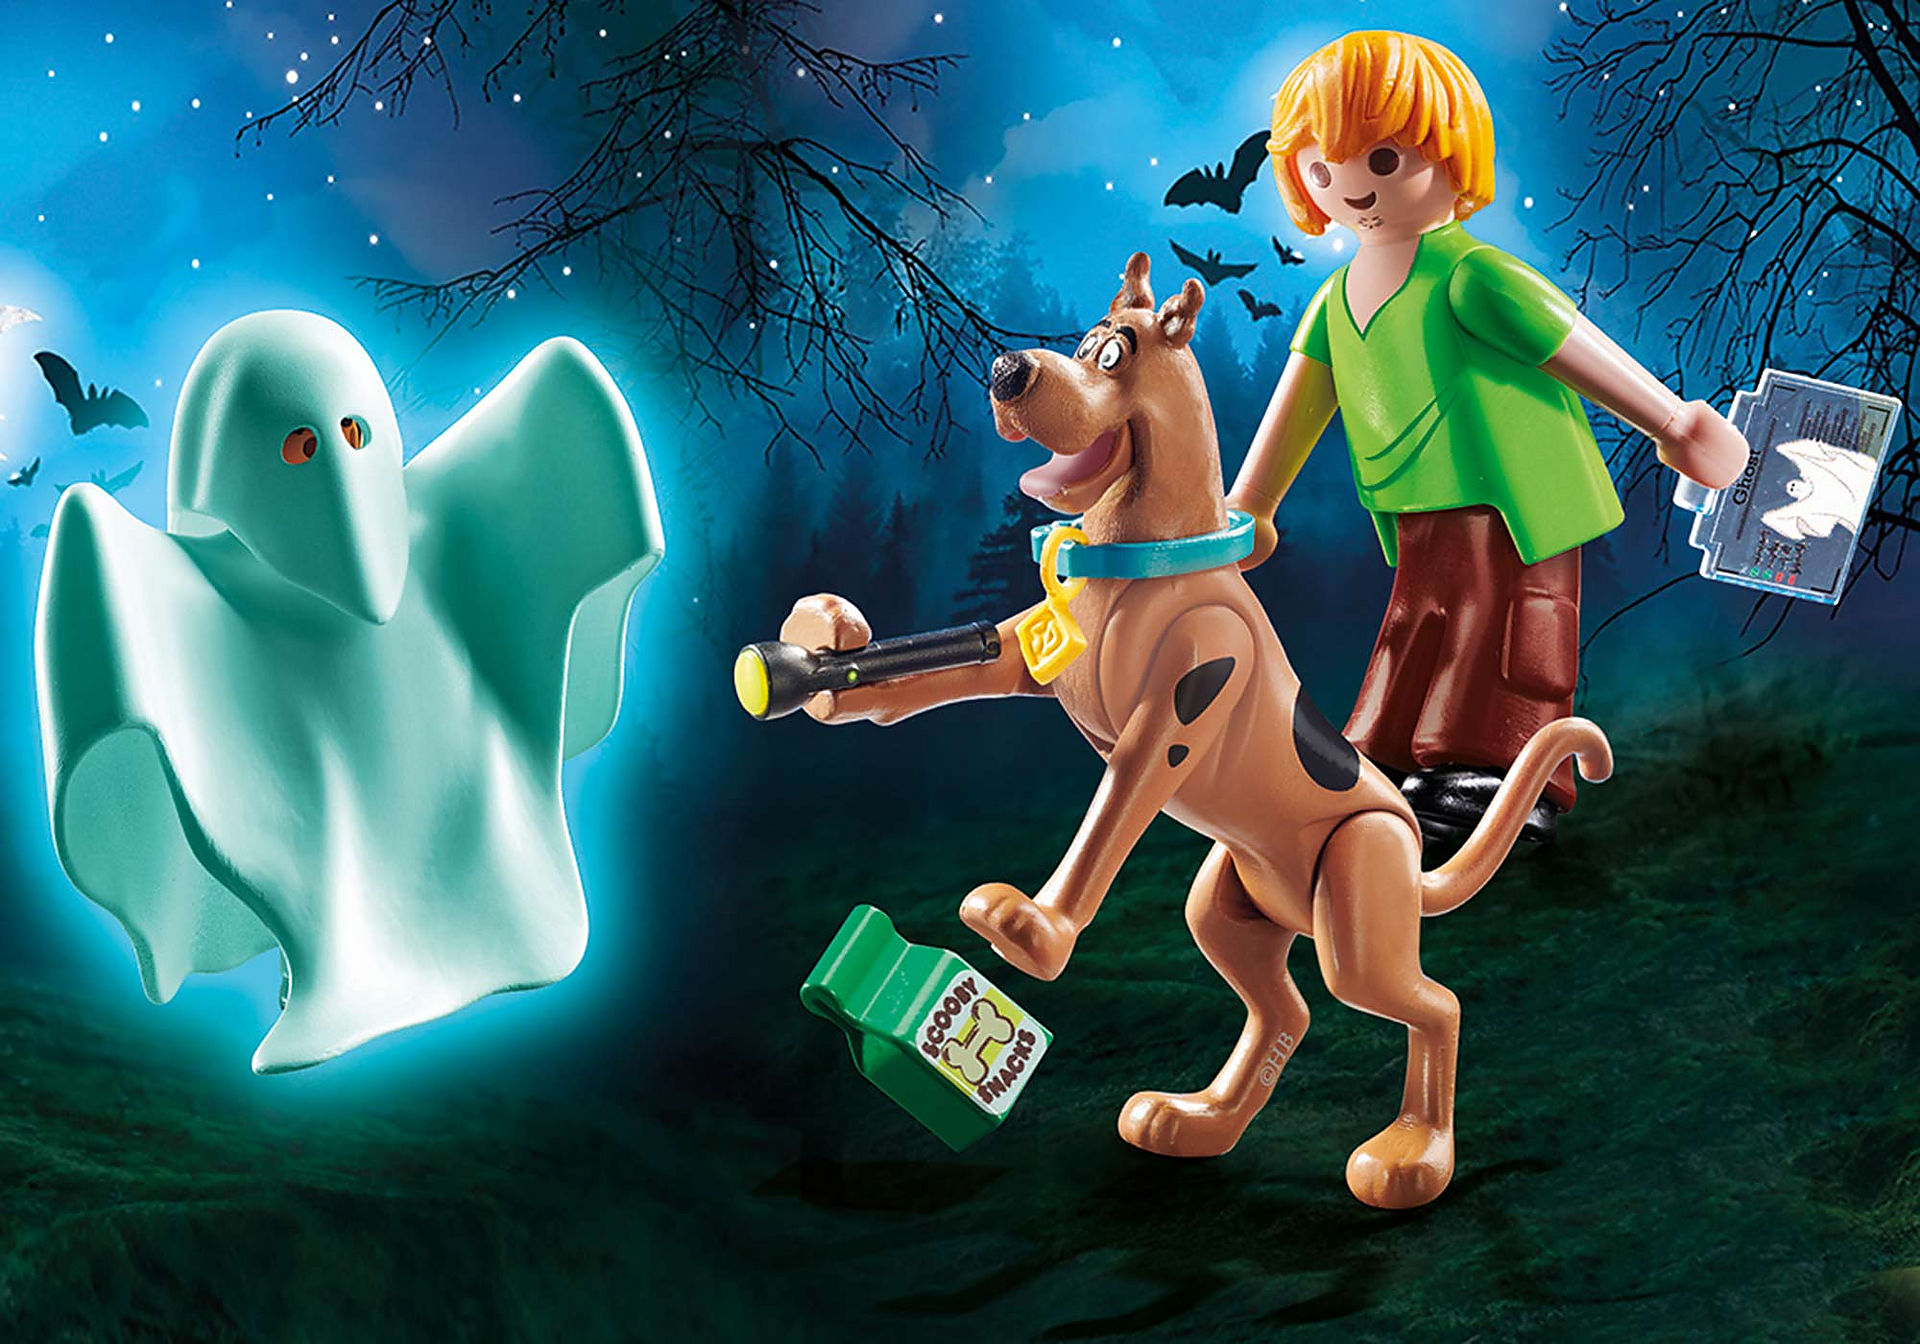 70287 SCOOBY-DOO! Scooby et Sammy avec fantôme  zoom image1